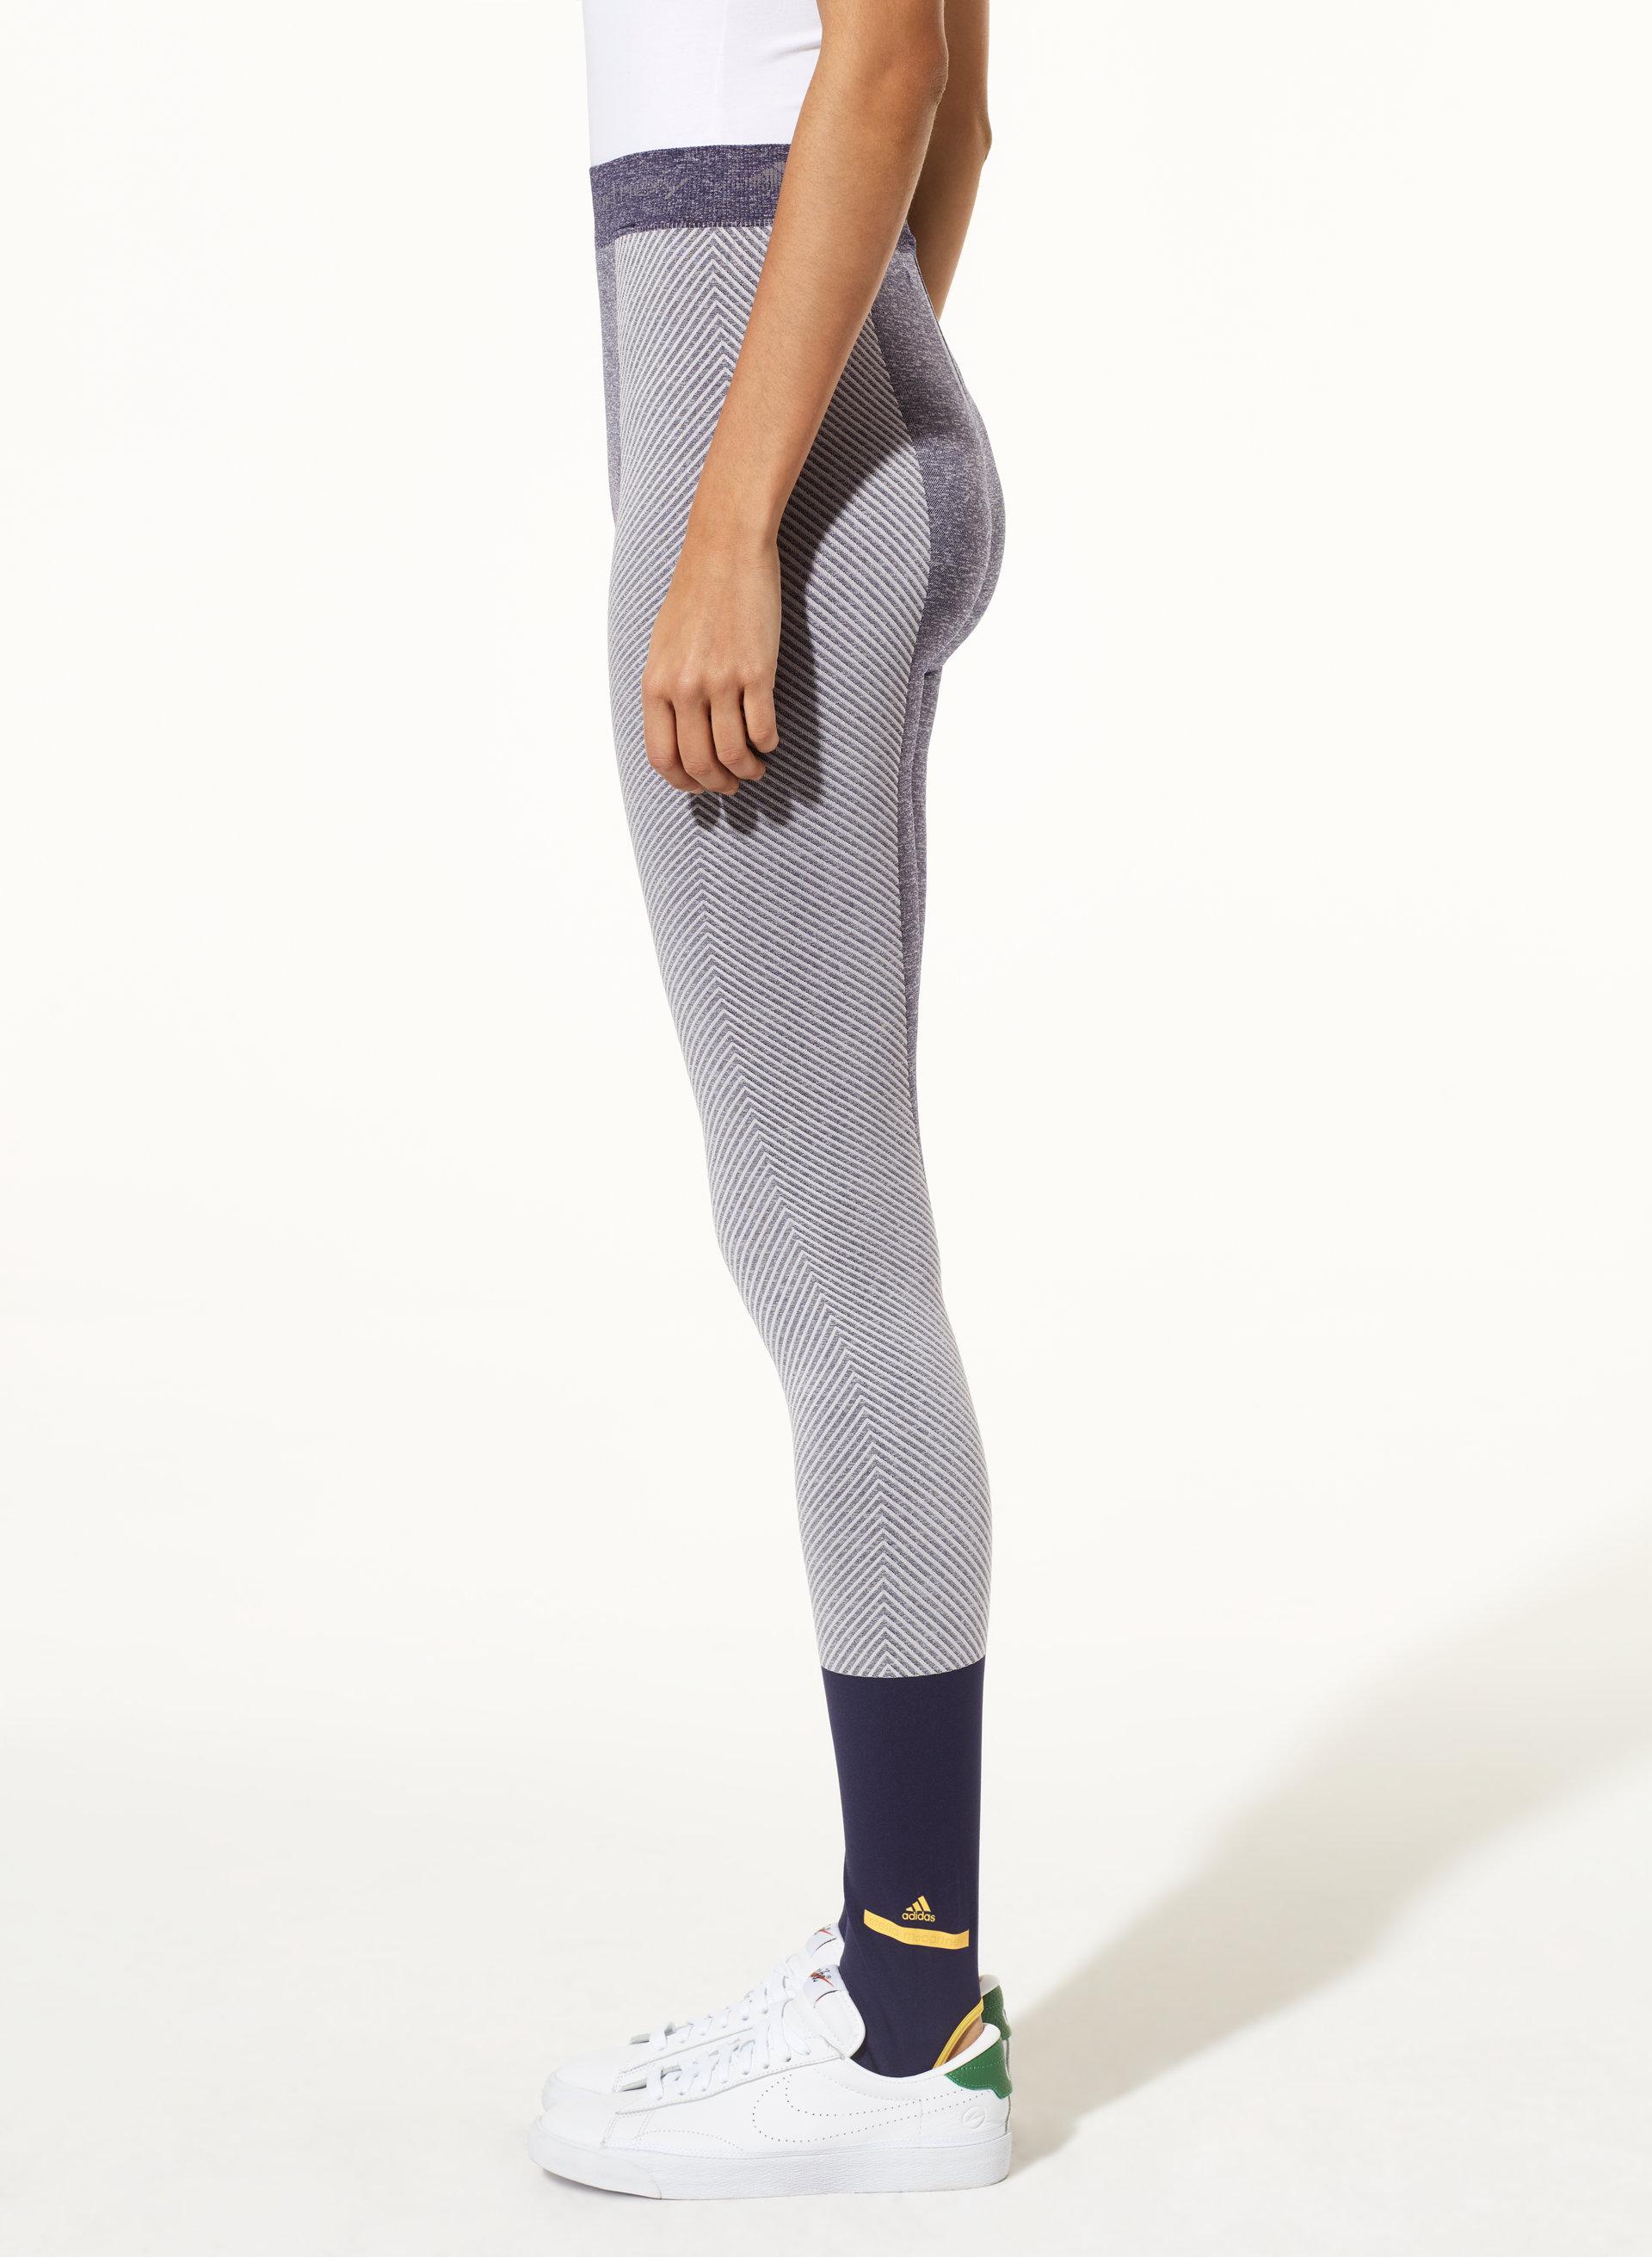 yoga shoes adidas